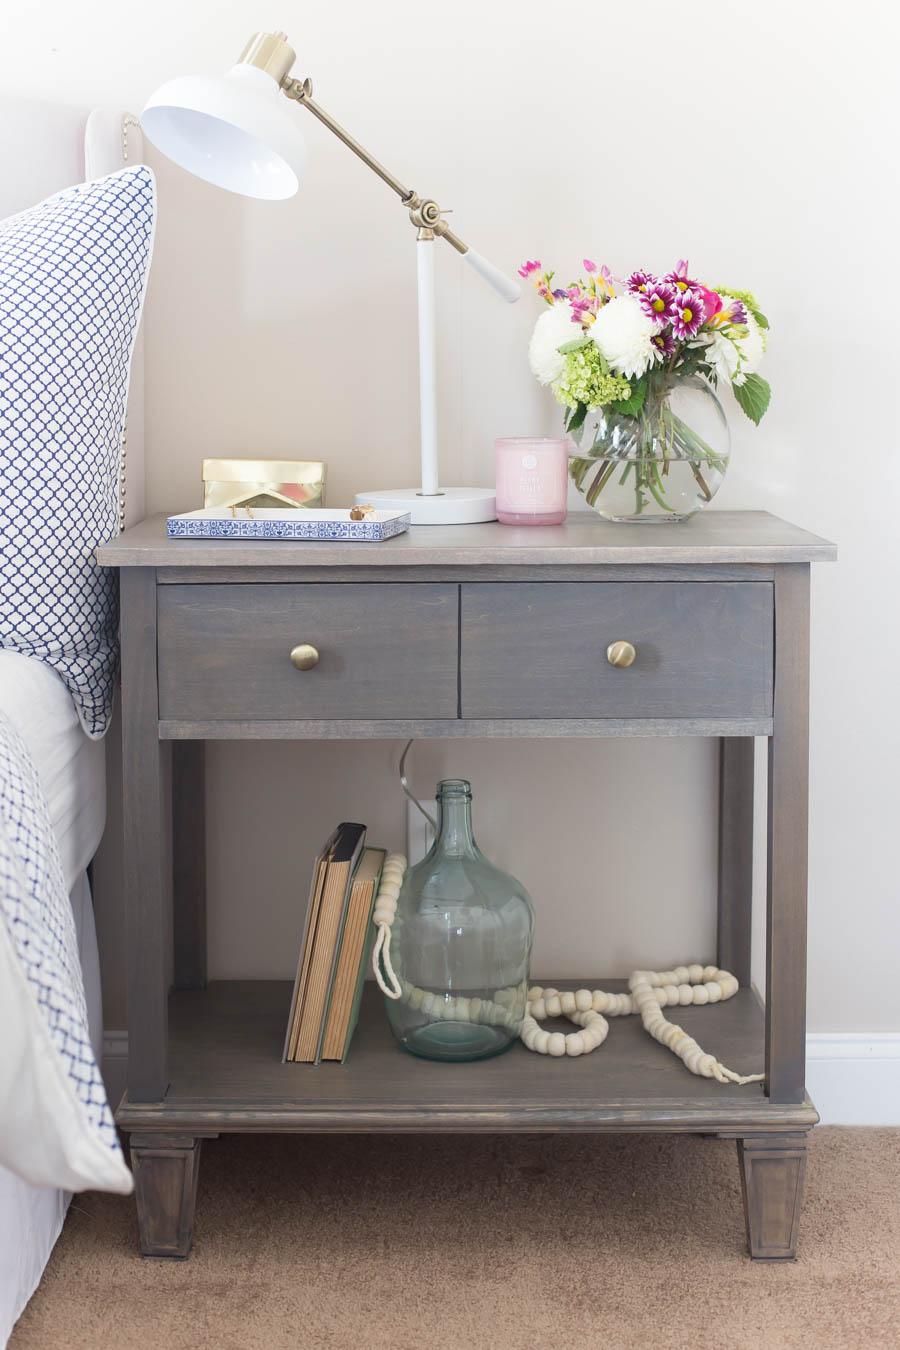 Diy Pottery Barn Inspired Sausalito Bedside Table